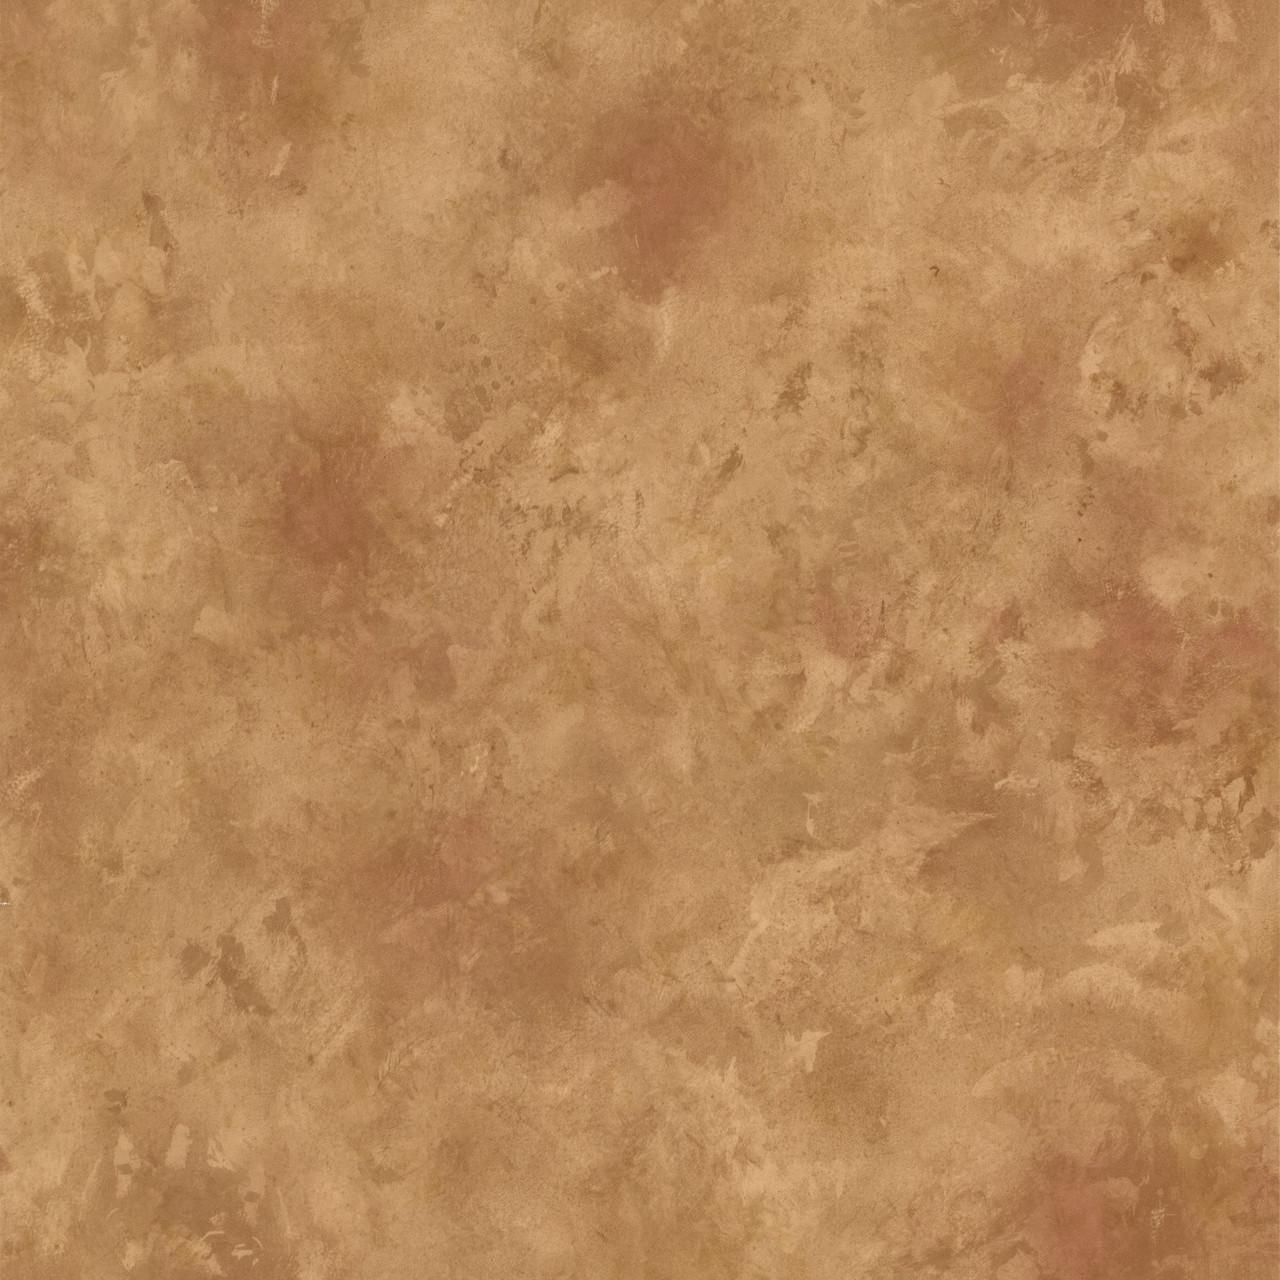 436-66424 - Ezra Light Brown Satin Marble wallpaper ...